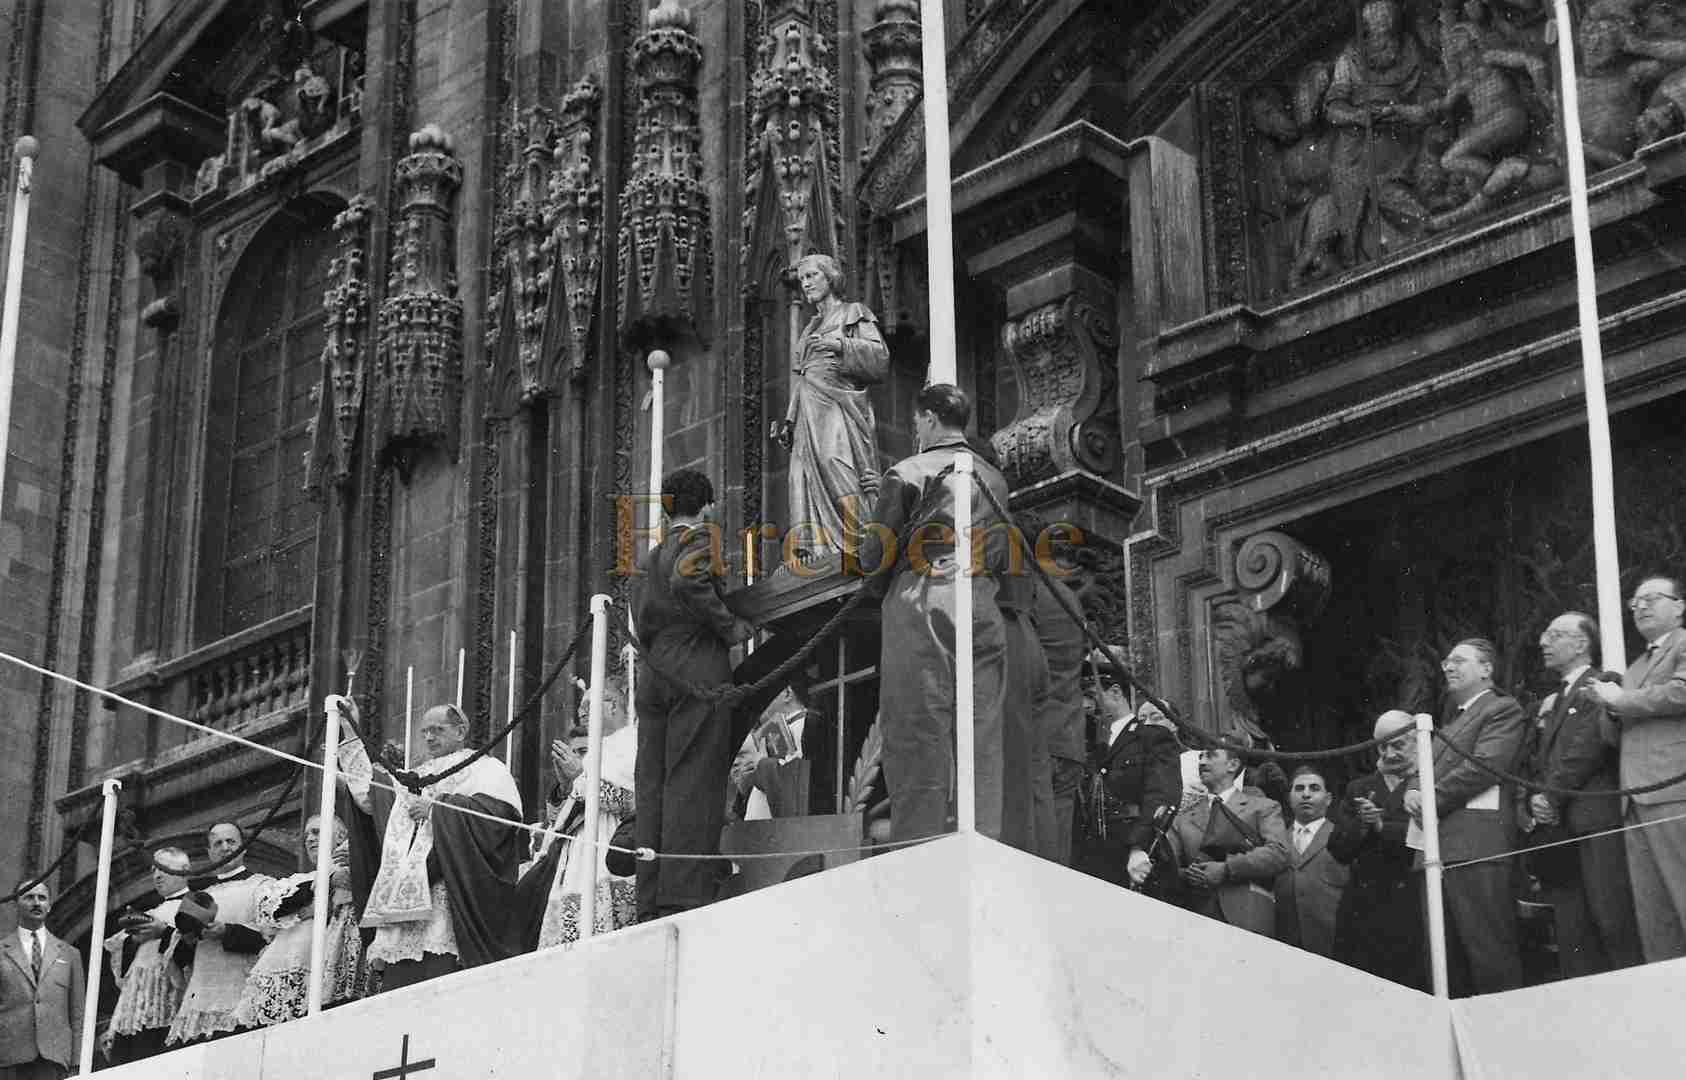 Acli Gesù Lavoratore 1956